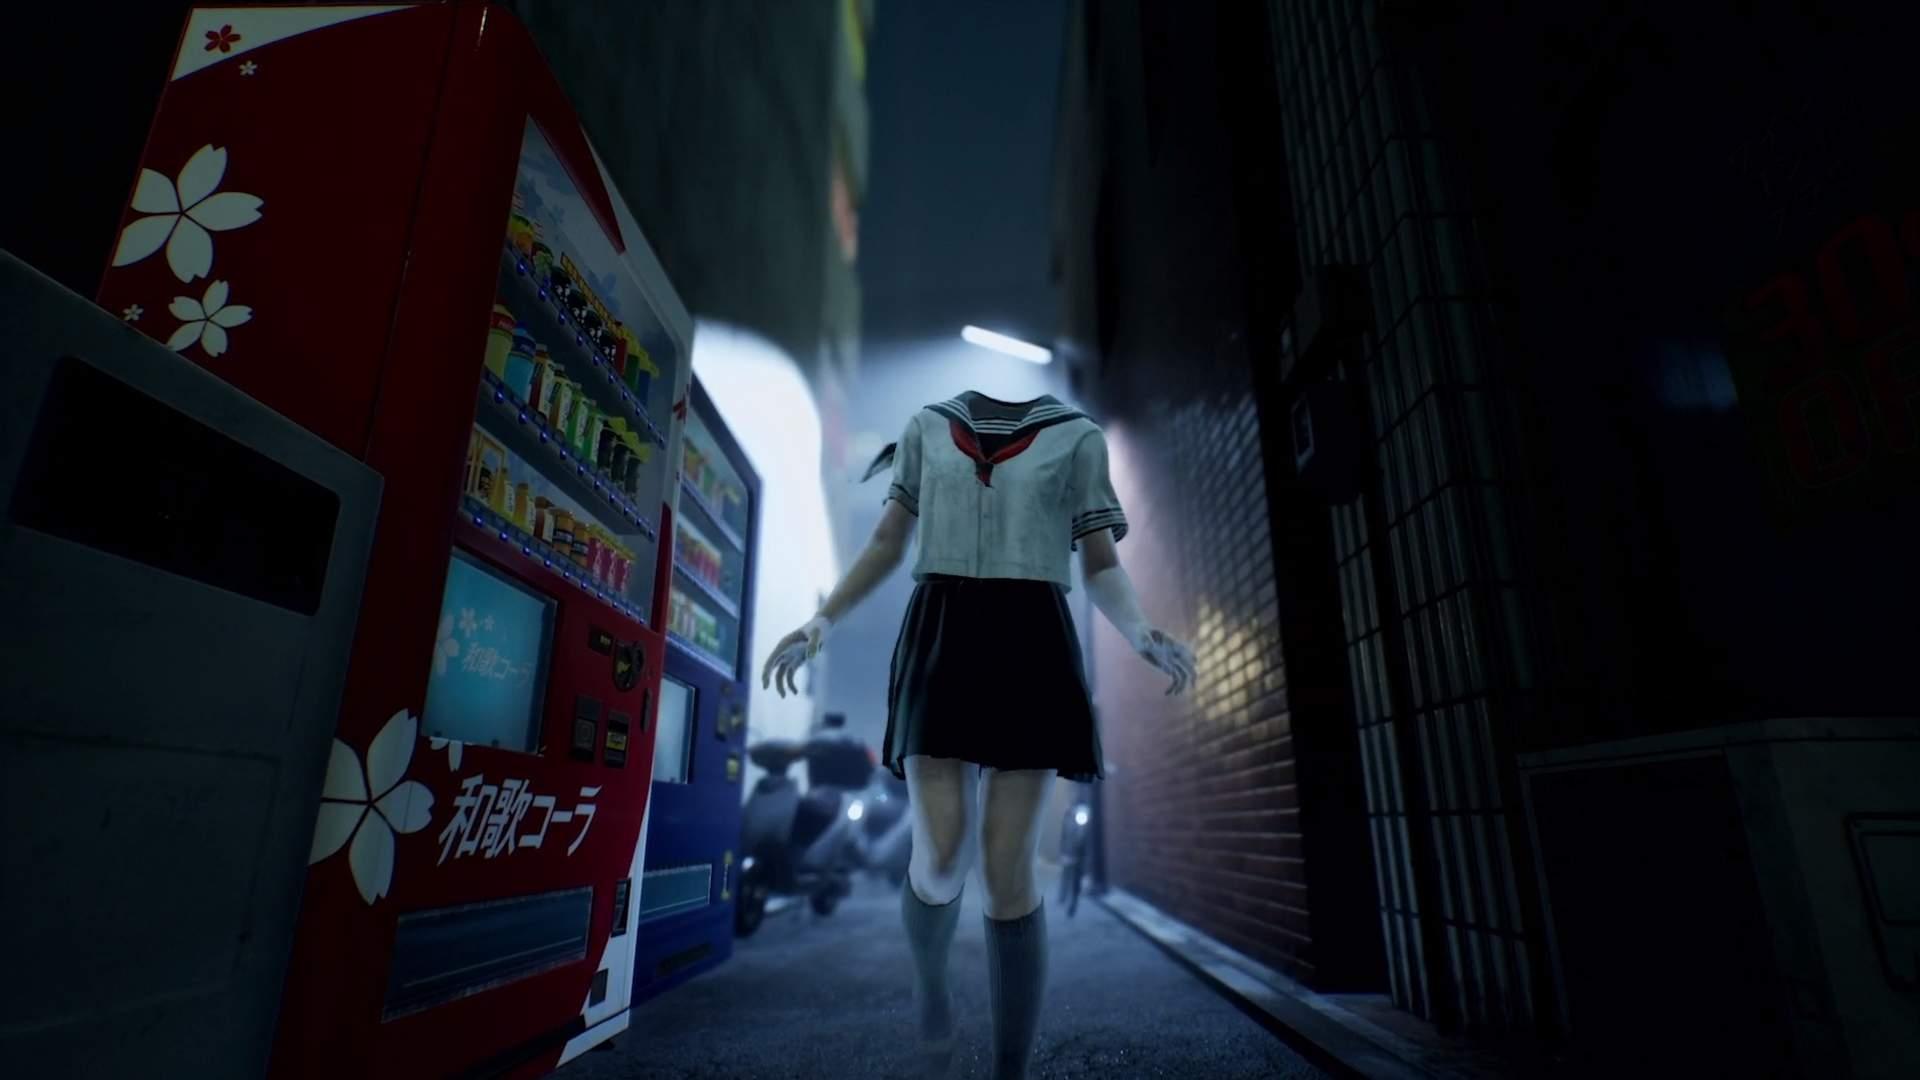 ghostwire tokyo ps5 wallpaper 72314